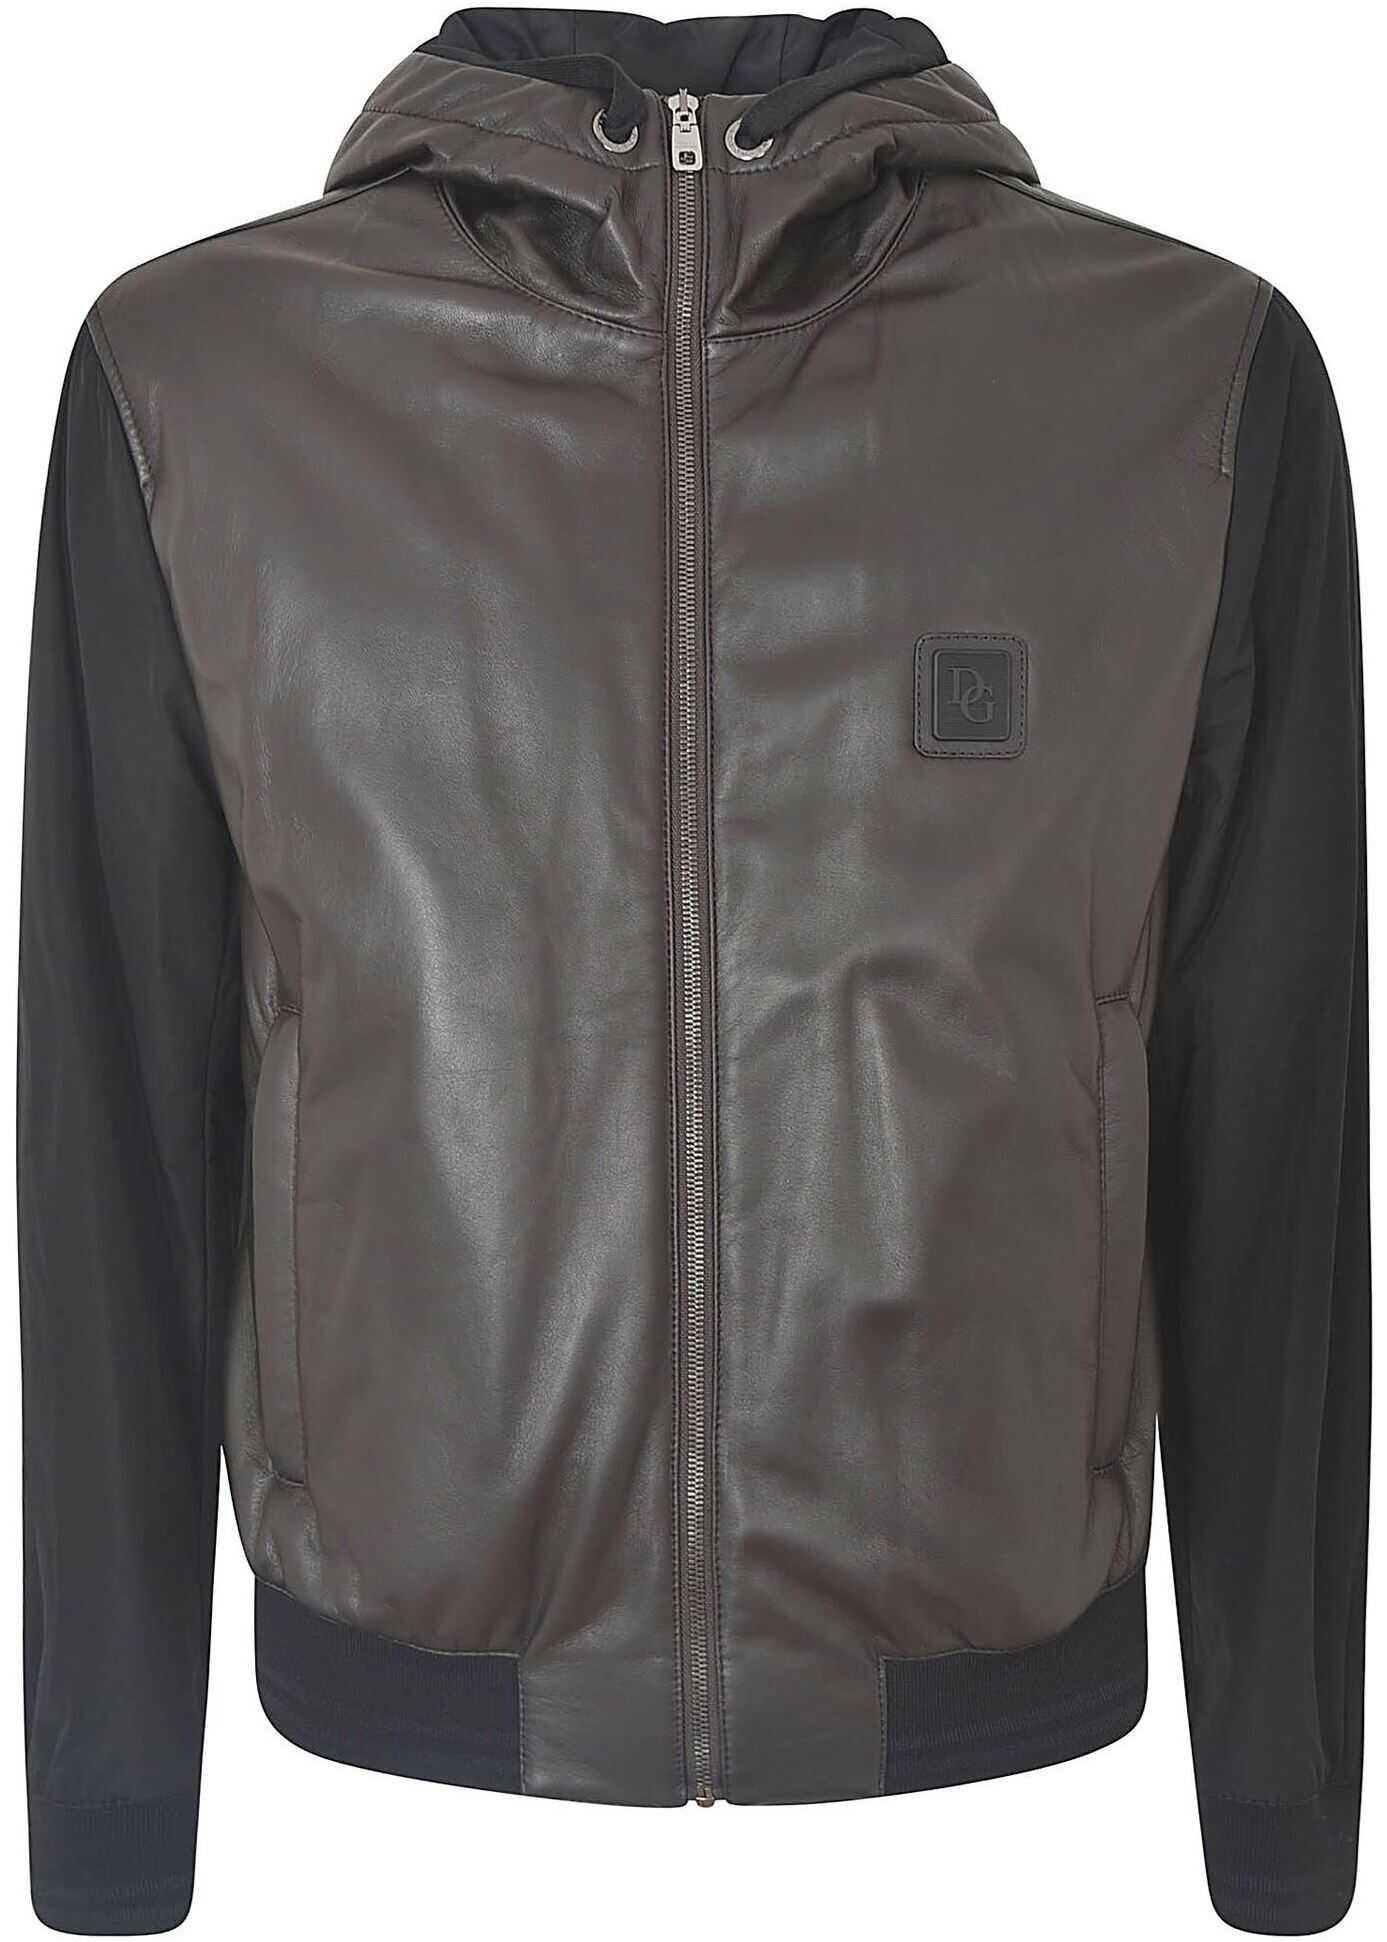 Dolce & Gabbana Black Jacket With Leather Detail Black imagine